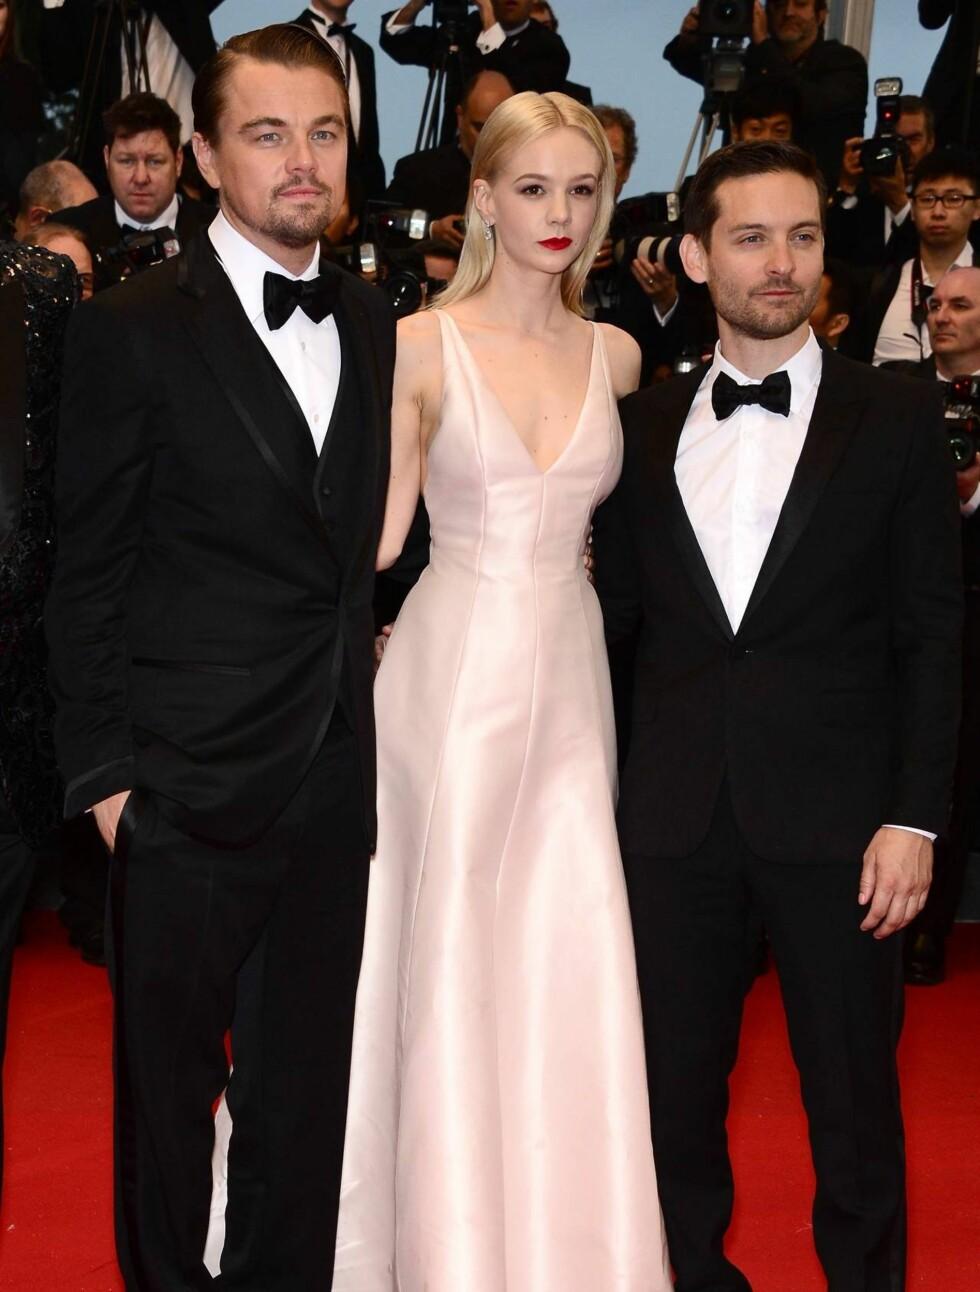 ÅPNINGSFEST: «The Great Gatsby»-kollegene Leonardo DiCaprio, Carey Mulligan og Tobey Maguire ankom rød løper i Cannes sammen onsdag kveld. Foto: All Over Press